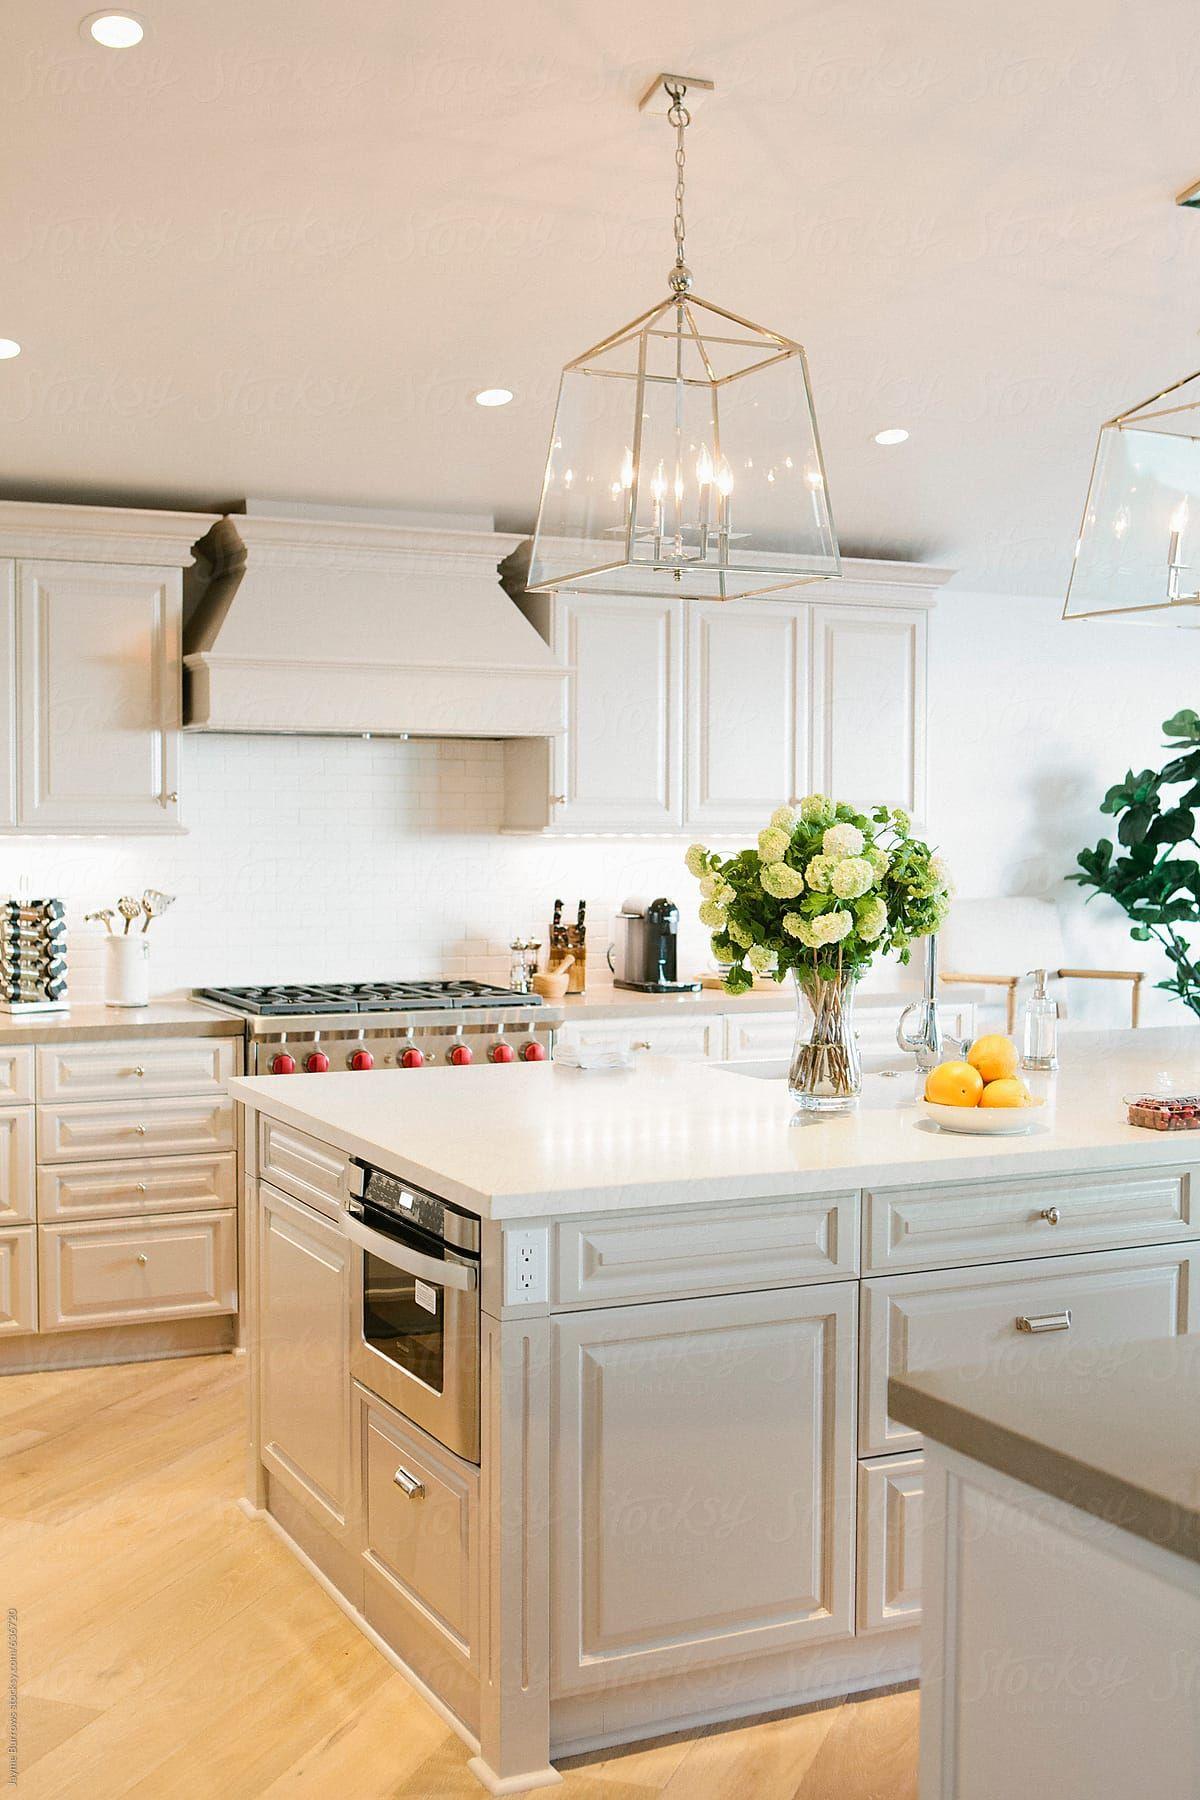 Best Luxury Kitchen Download This High Resolution Stock Photo 400 x 300